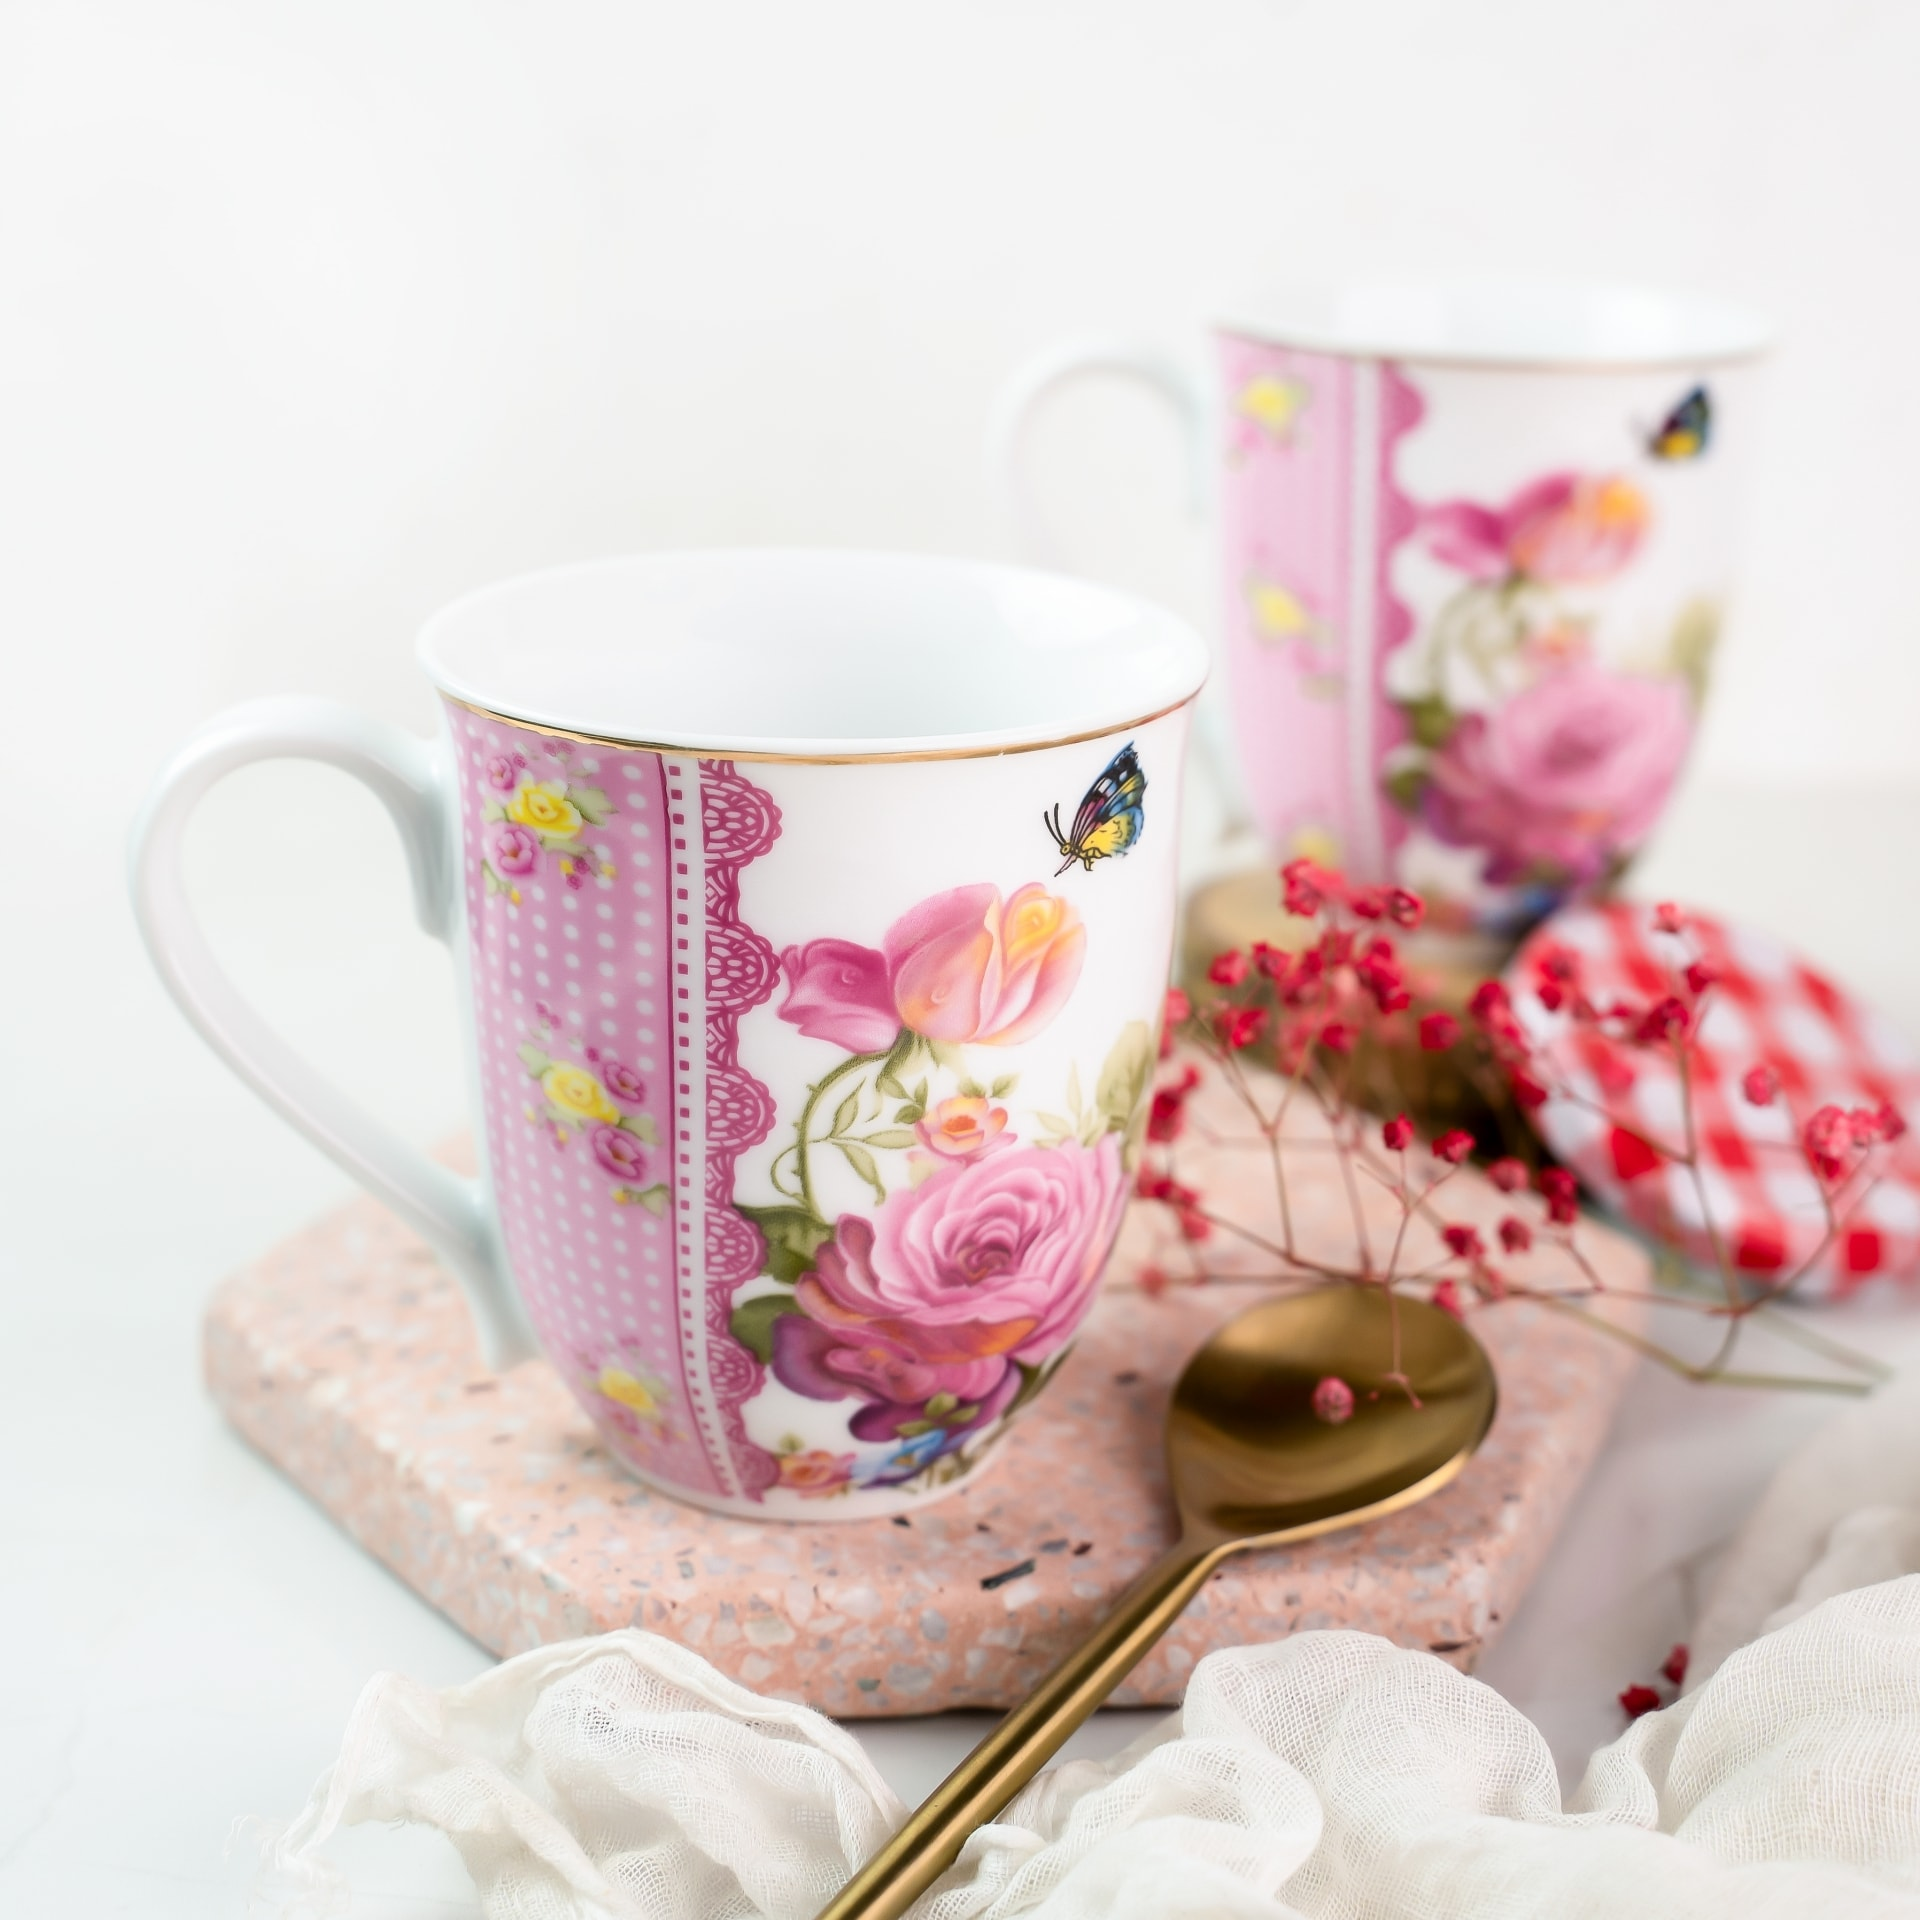 Viola Paeonia Blossom Porcelain Coffee Mug